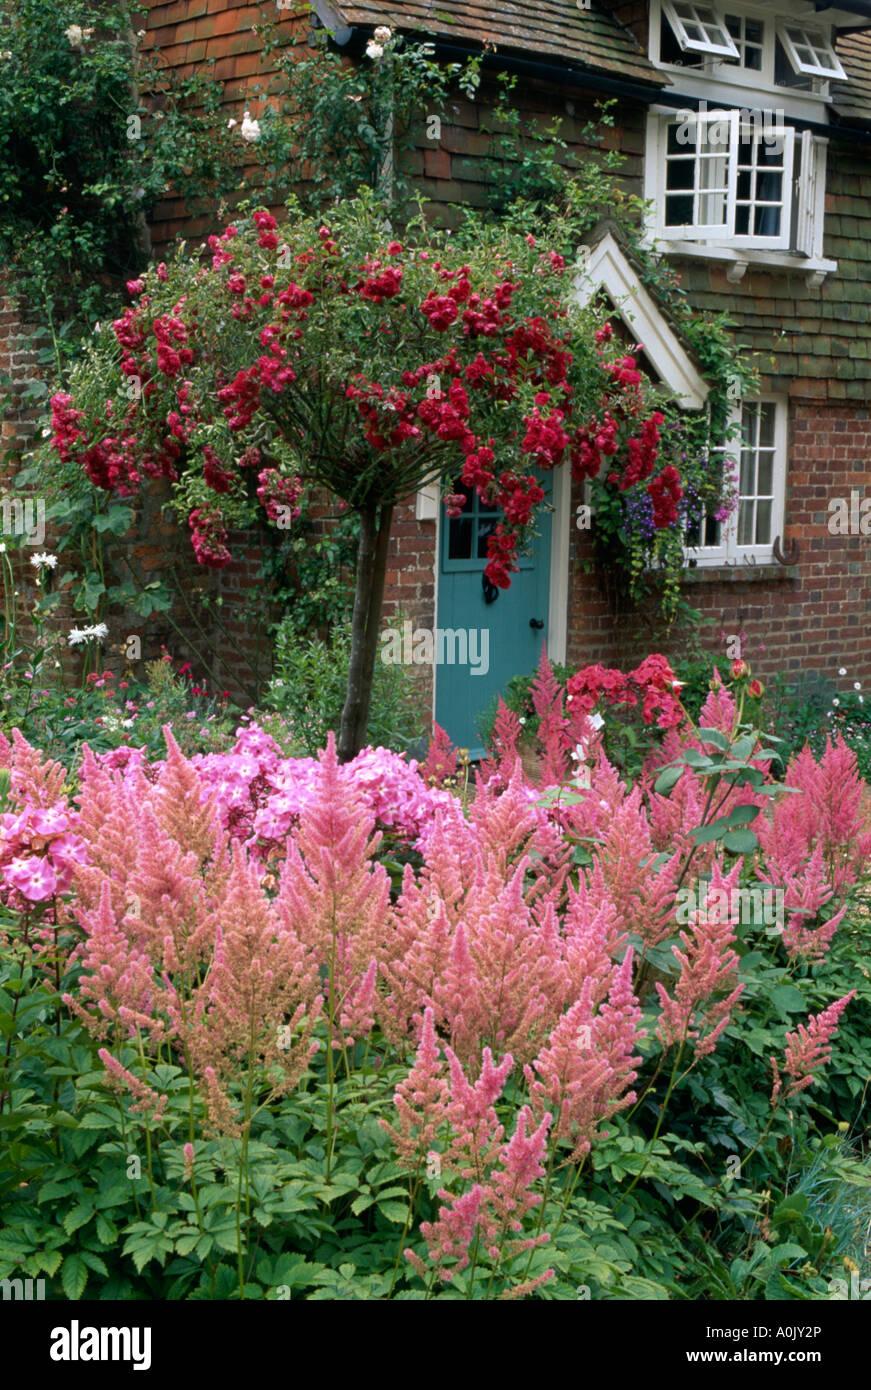 astilbe rose et rouge rose standard arbre dans le jardin en face de